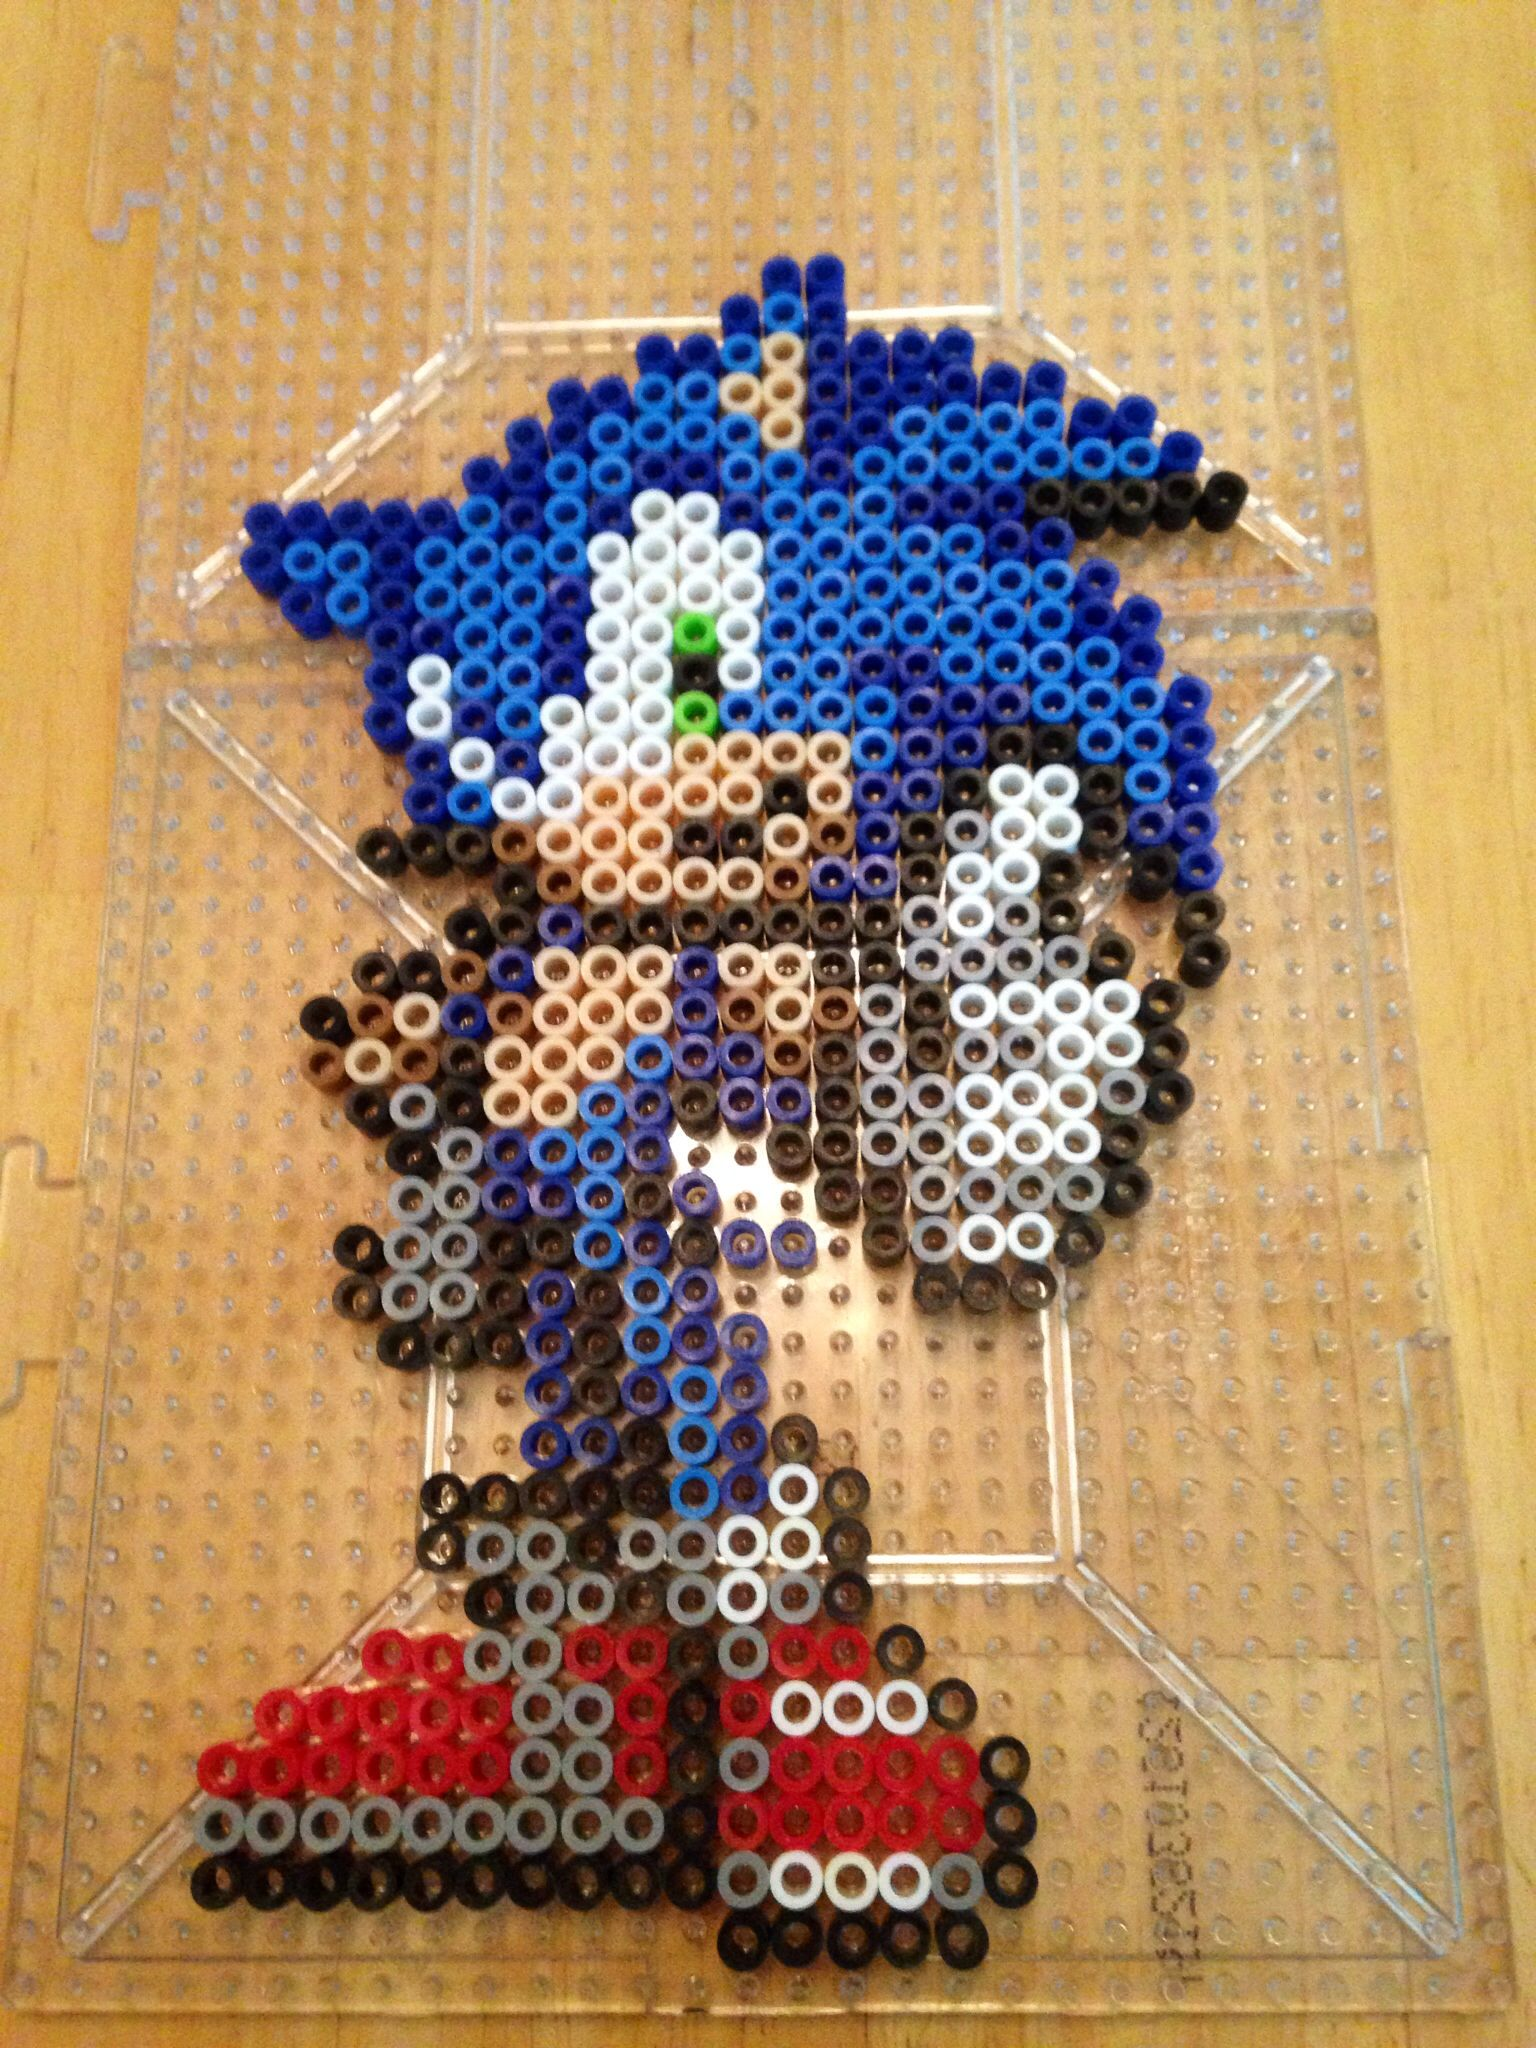 Sonic Fuse Diagram Wiring Library The Hedgehog Perler Bead Hama Pattern Pixel Art Beads Kitsunekay